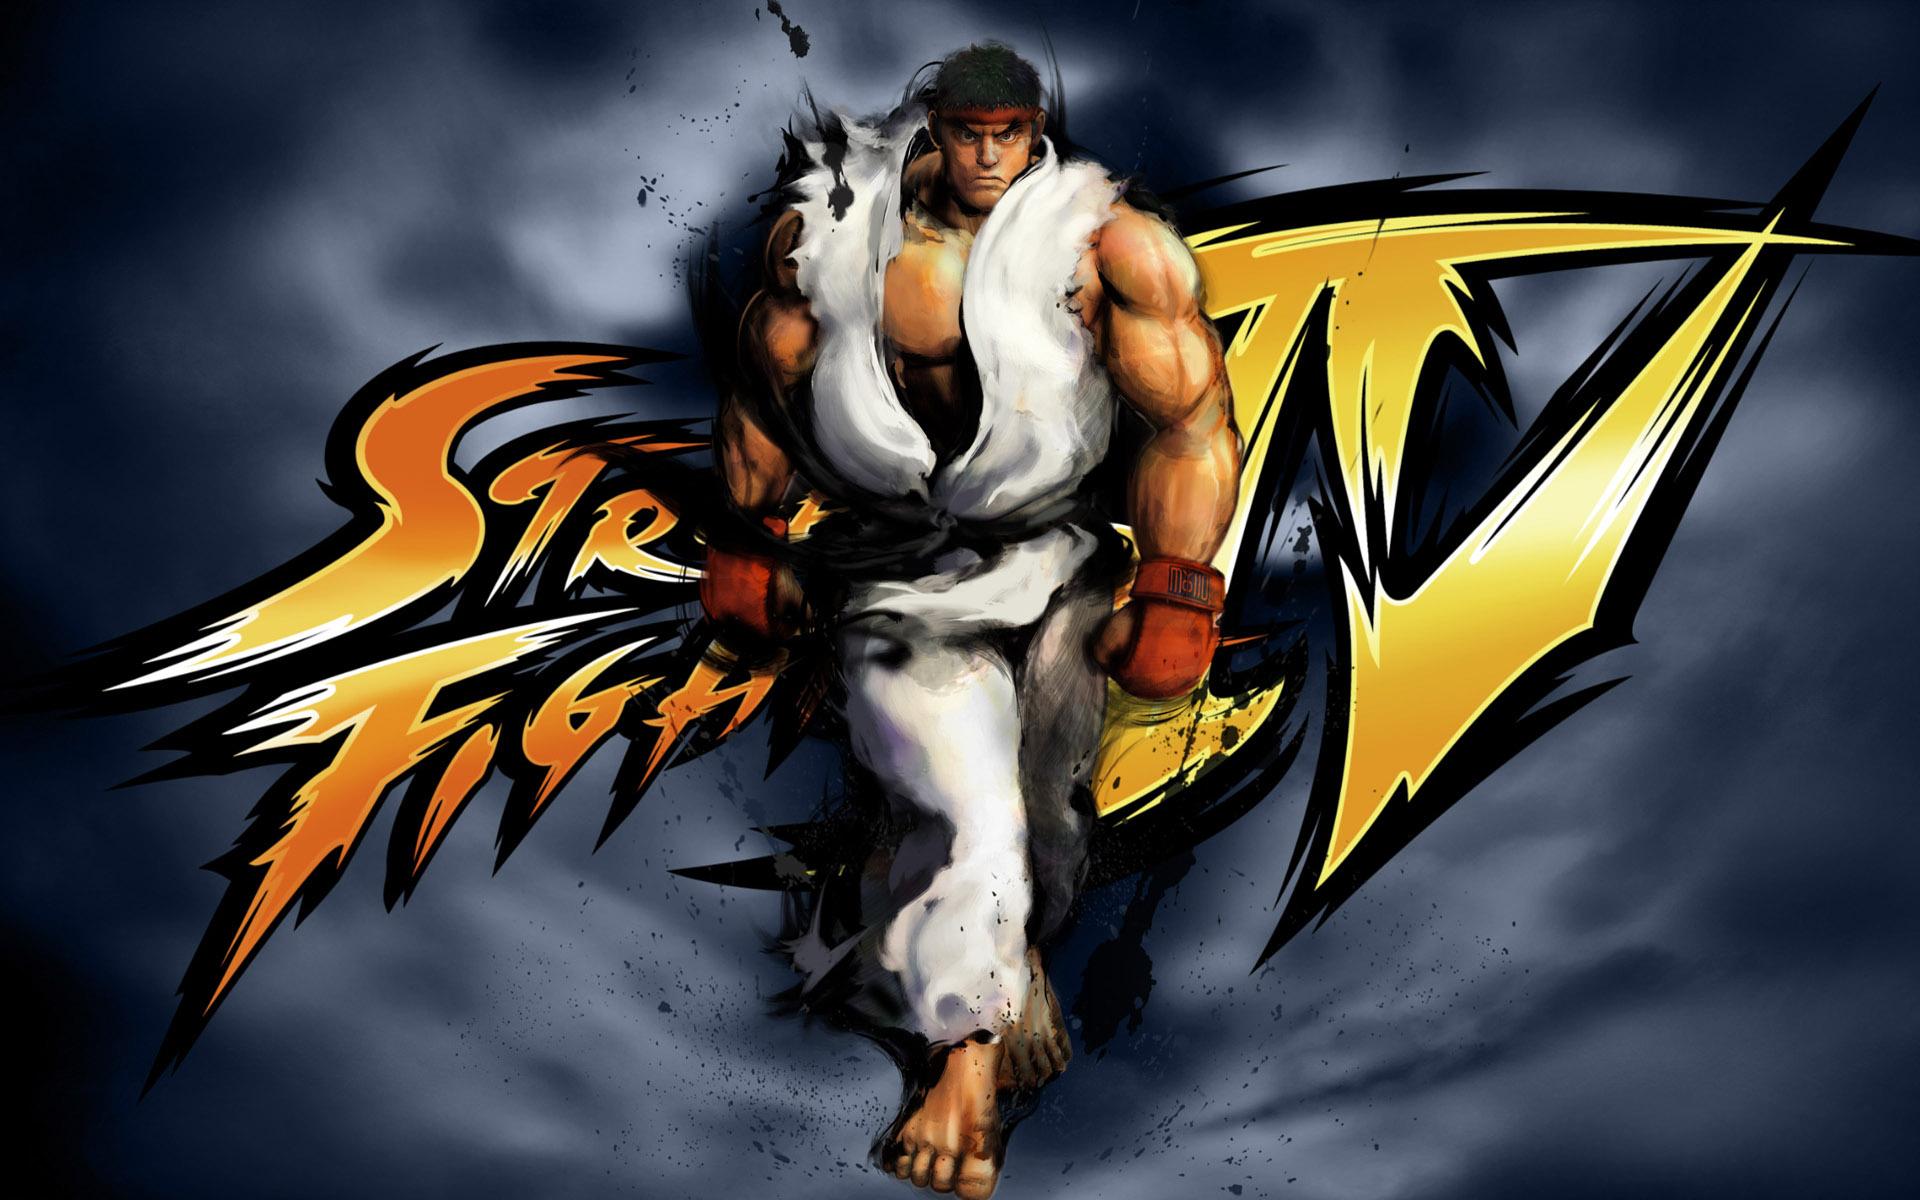 Street Fighter 5 Wallpaper: Street Fighter 4 Wallpapers